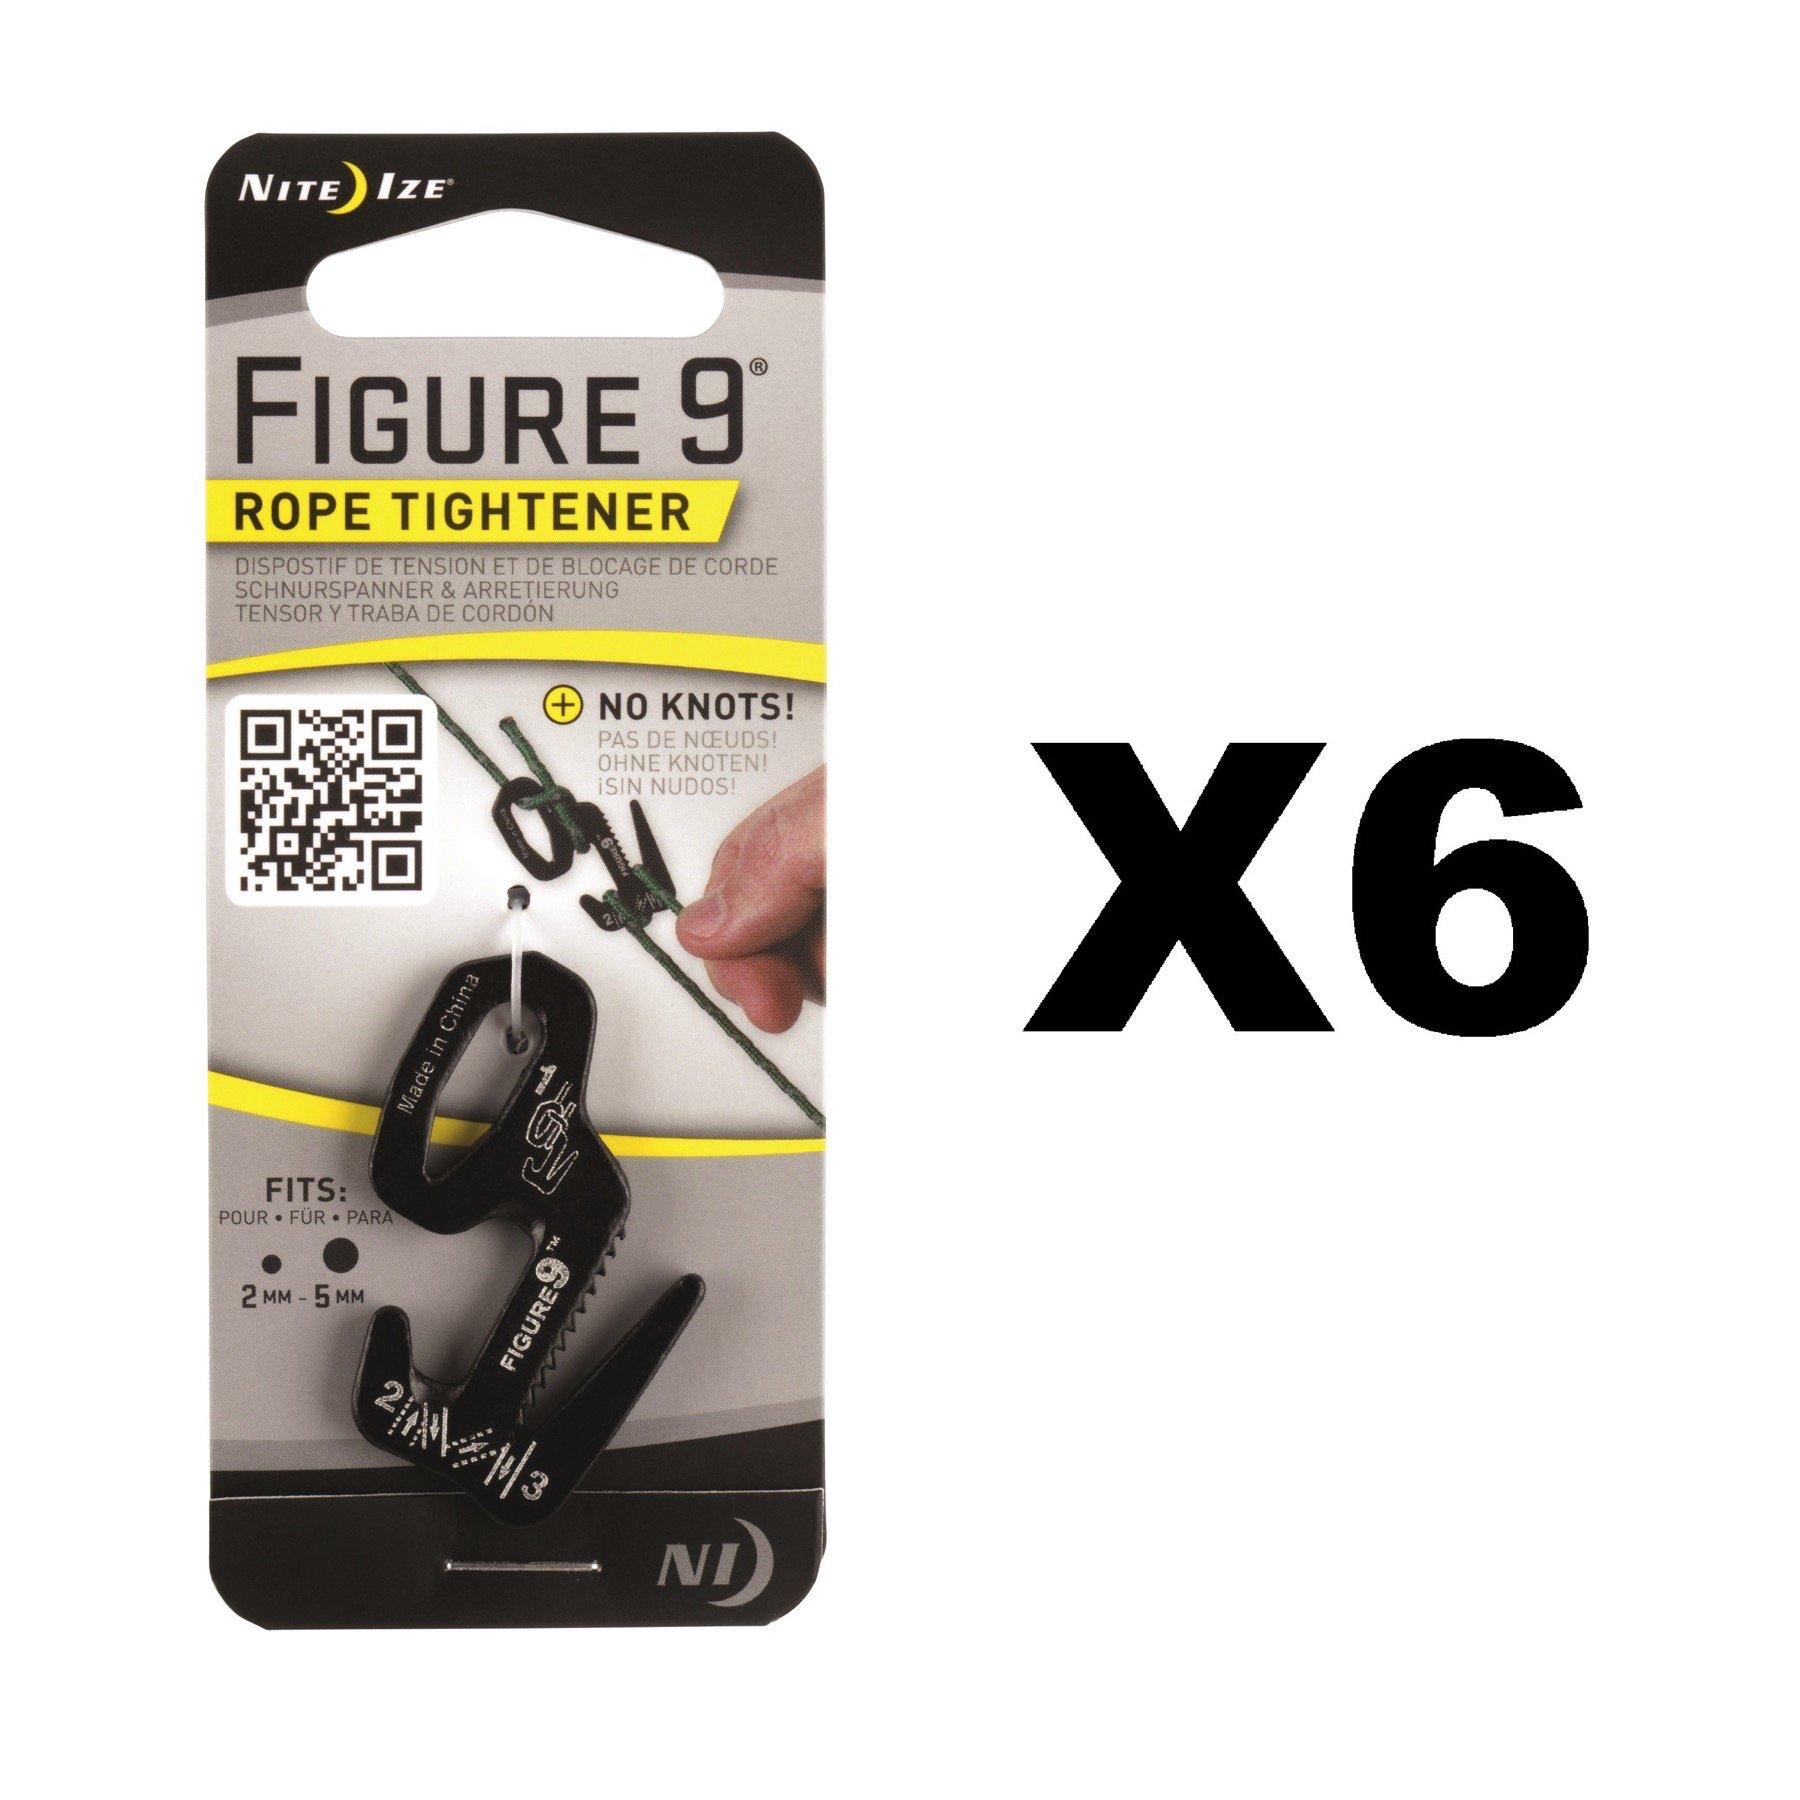 Nite Ize Figure 9 Rope Tightener Small Black Aluminum Tie Down Tool (6-Pack)